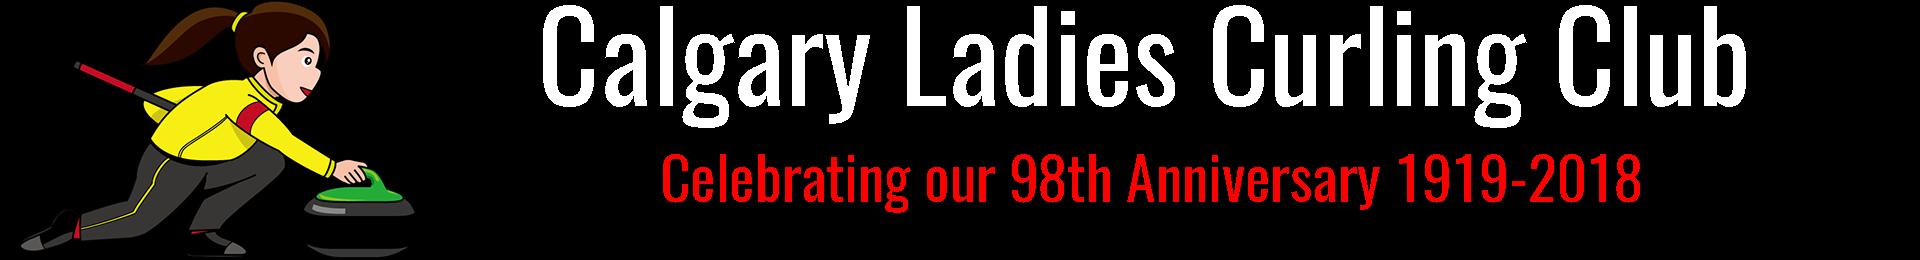 Calgary Ladies Curling Club